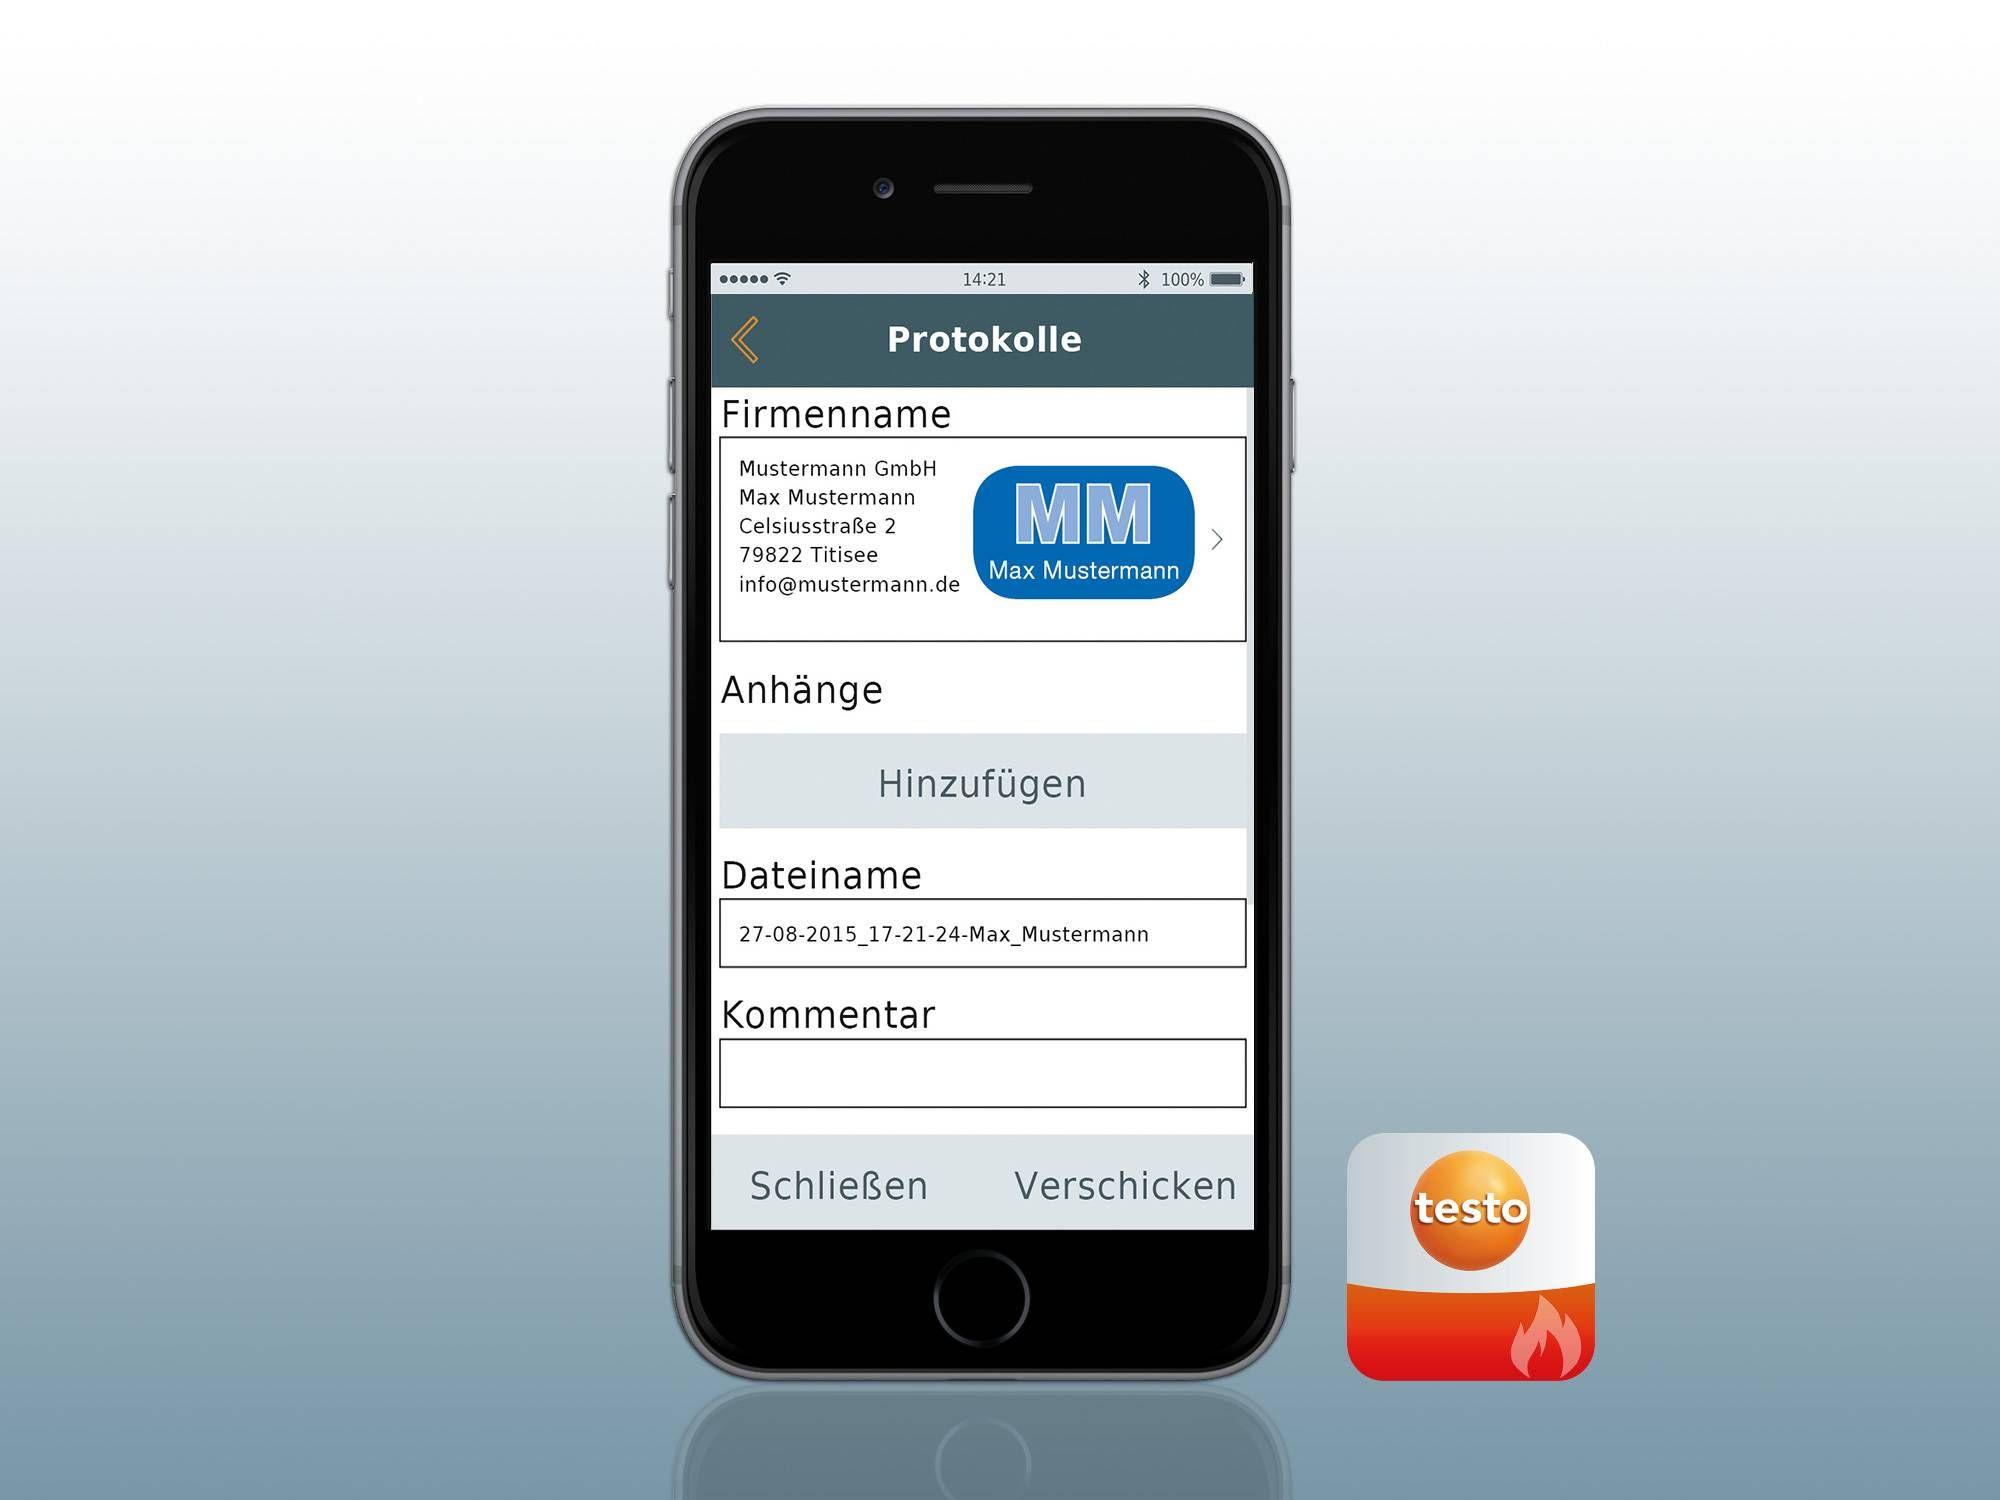 HVACR_Dachkampagne_Landingpage_Images_App-Screens_06_DE_2000x1500px.jpg